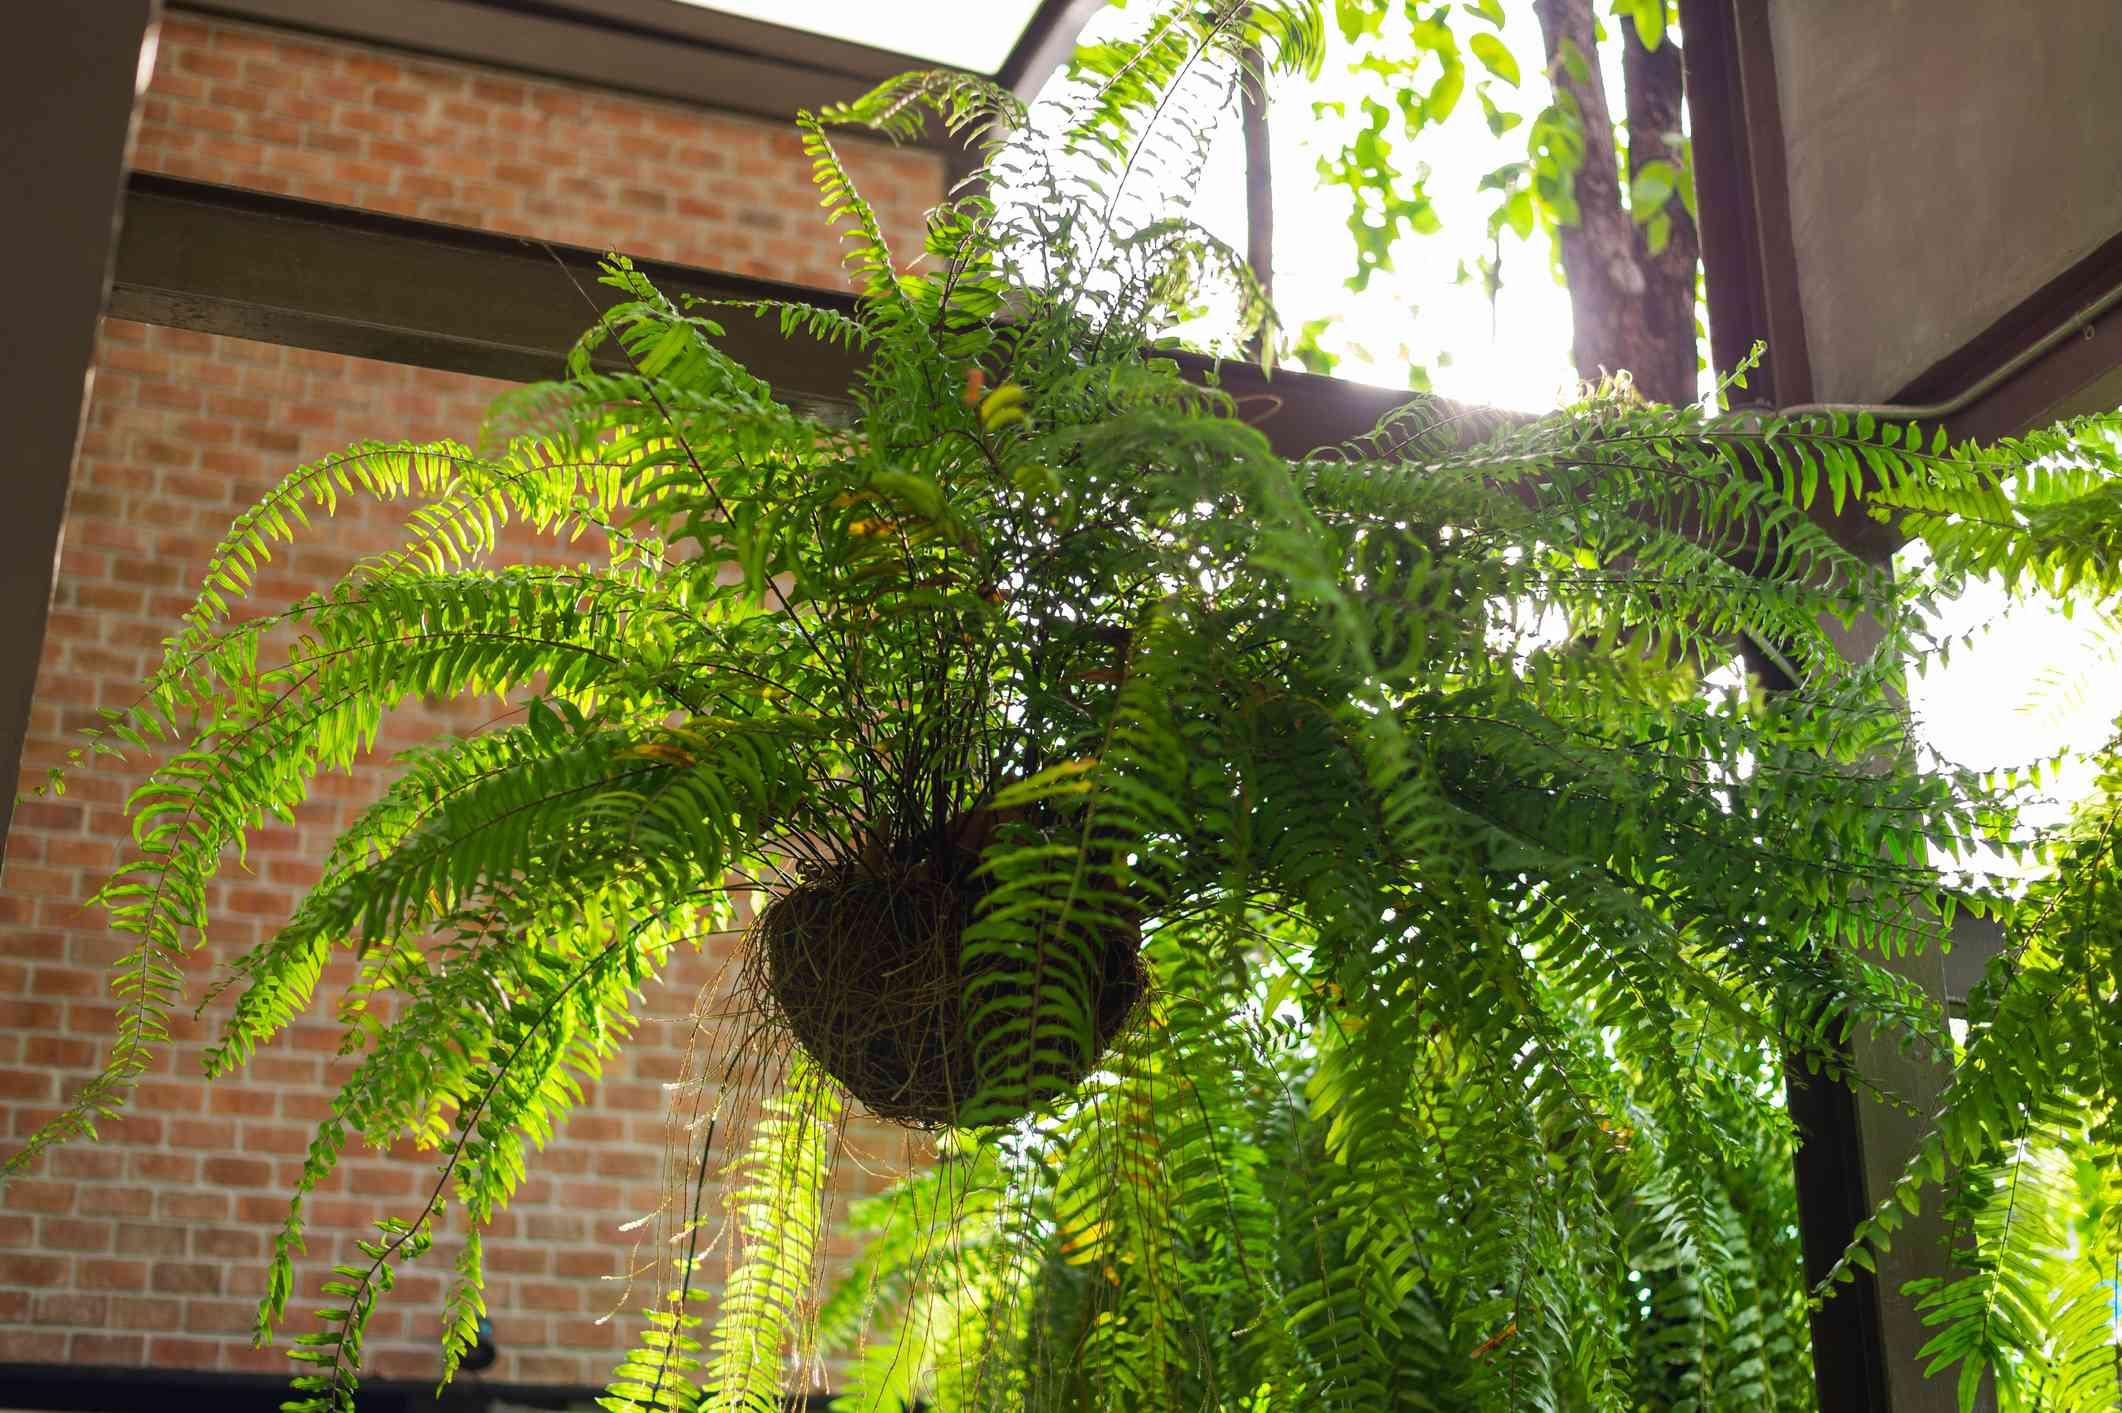 Boston fern in hanging planter